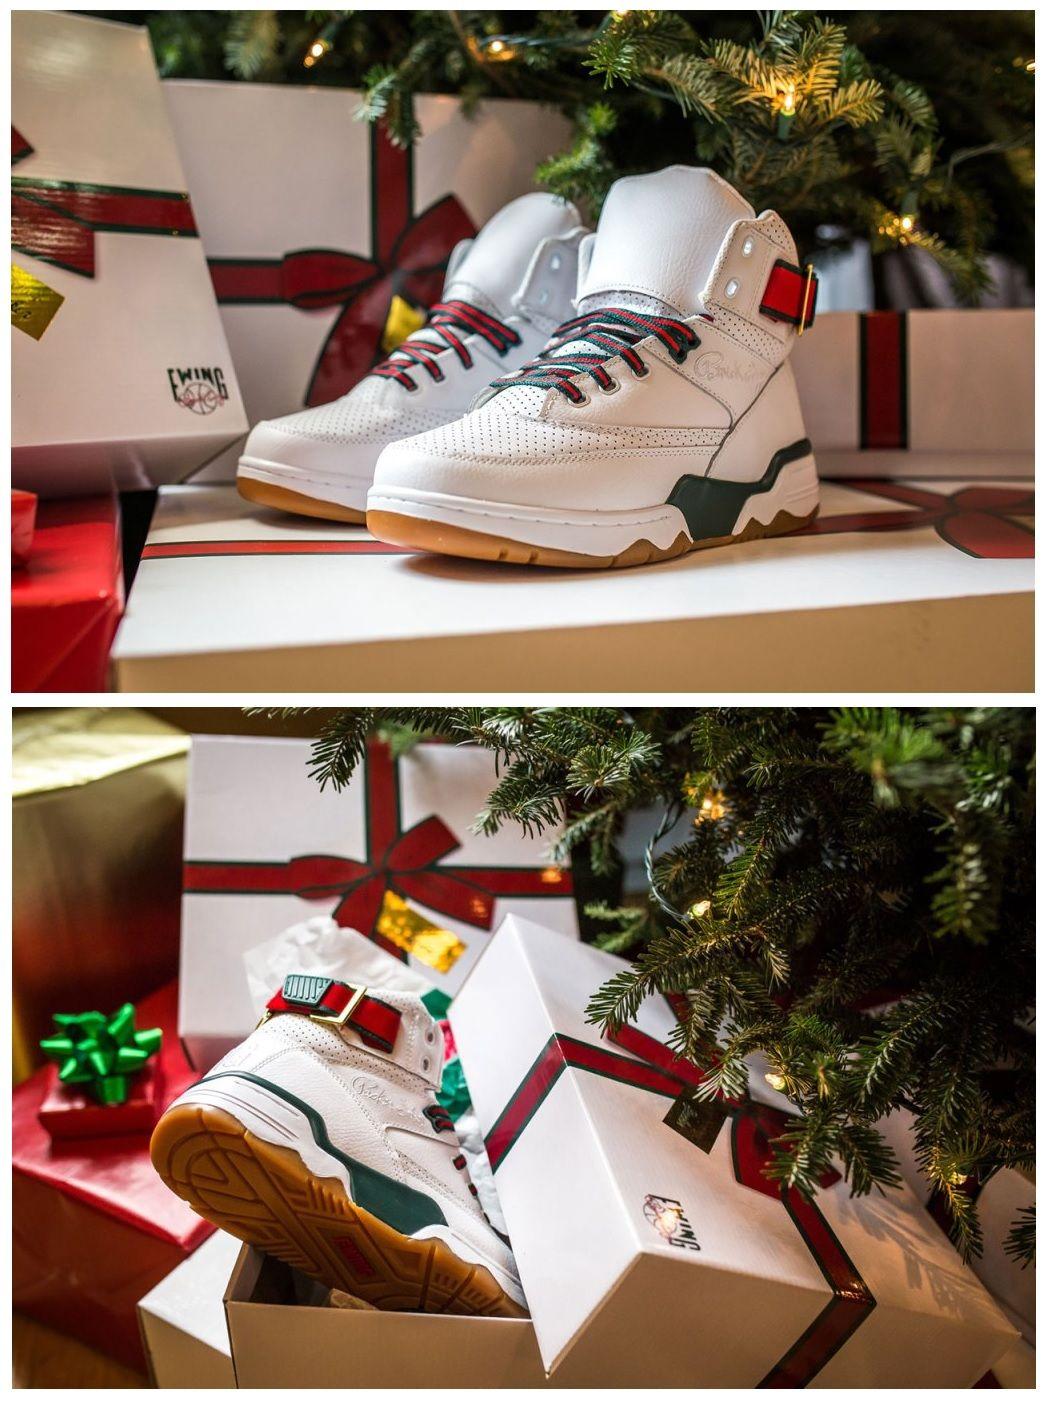 big sale 8df0f 8818b Packer Shoes x Ewing 33 Hi